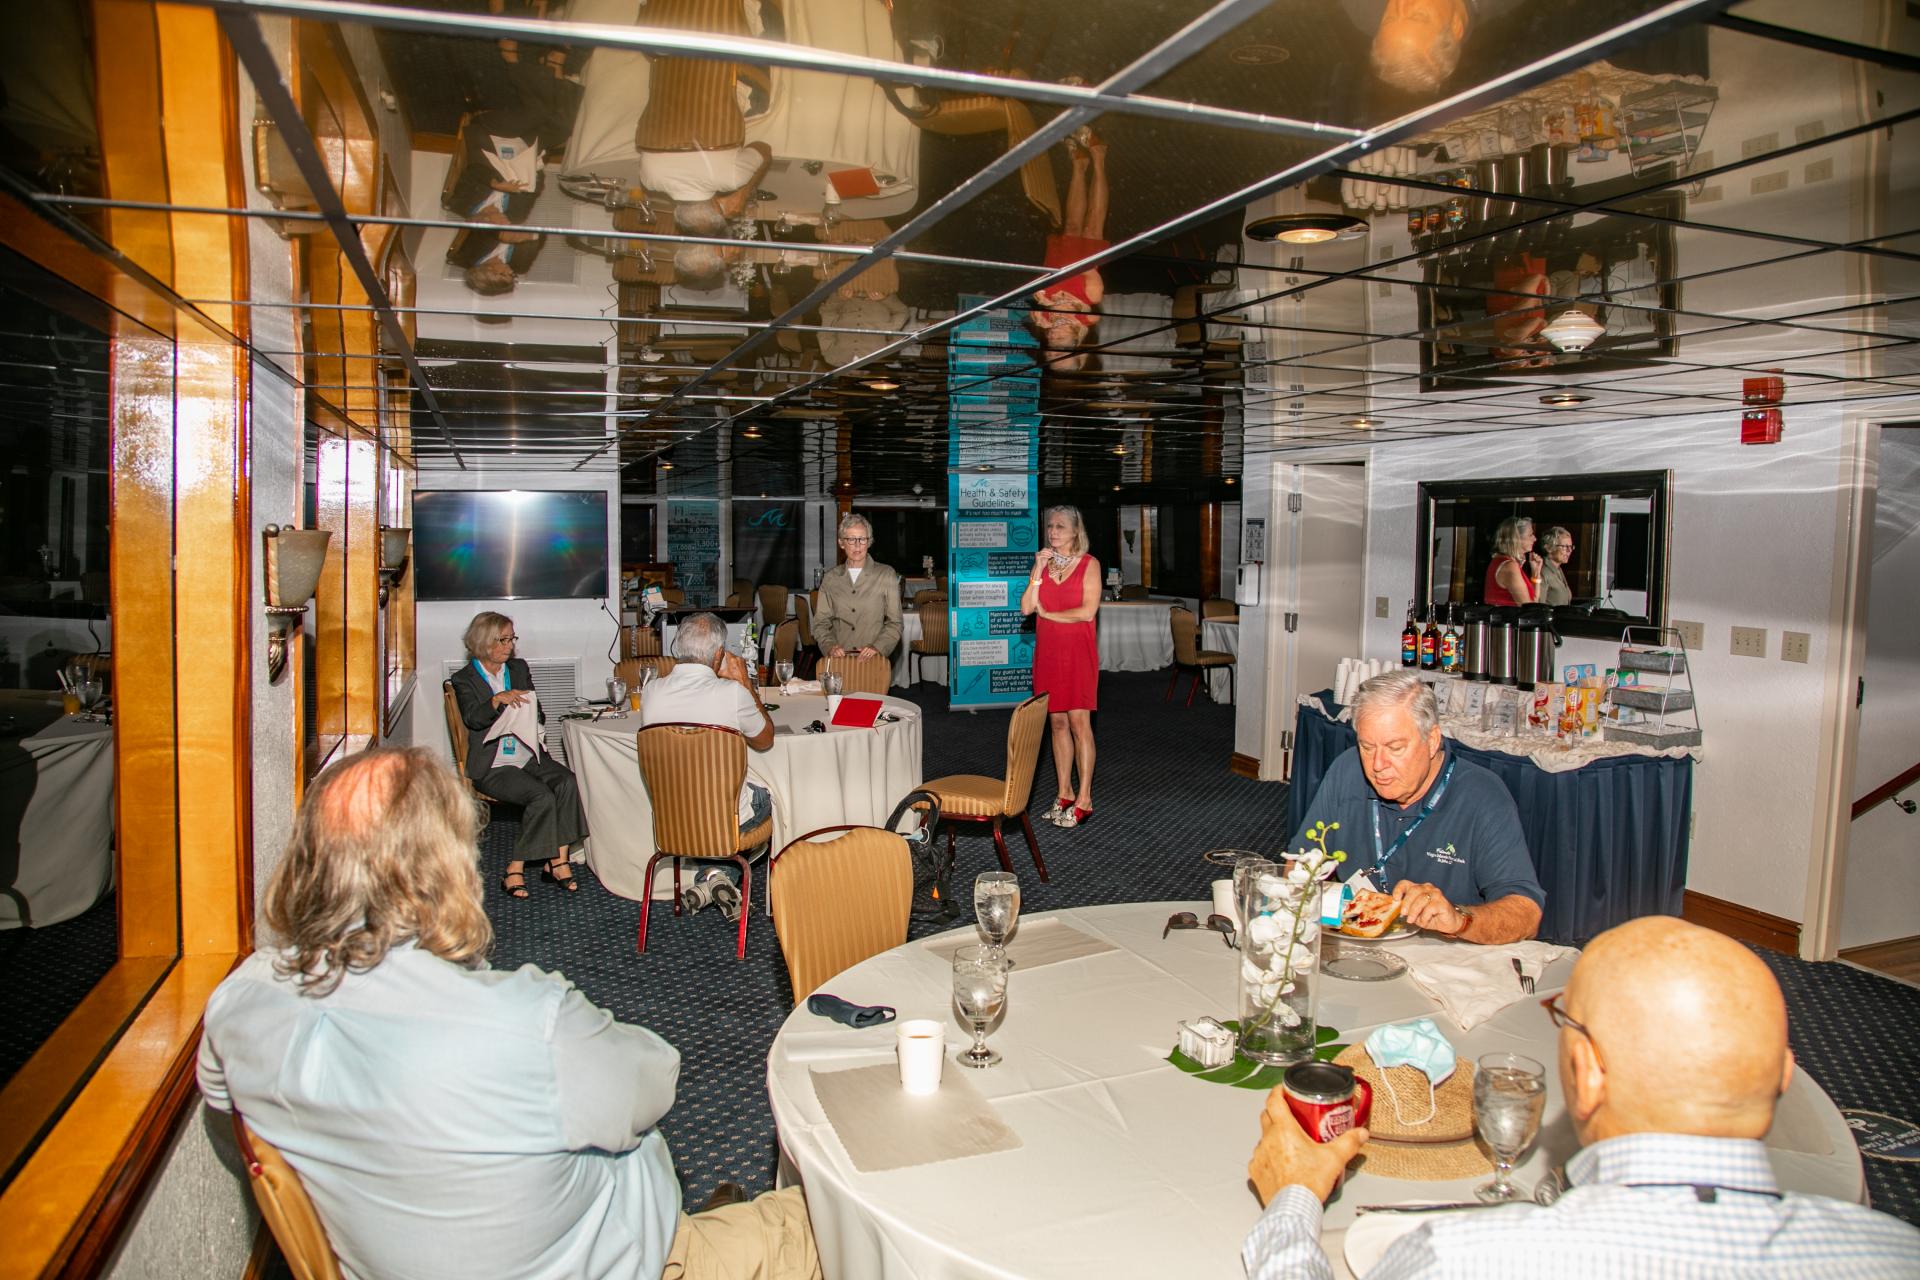 MIASF News - Marine Research Hub and Ocean Exchange